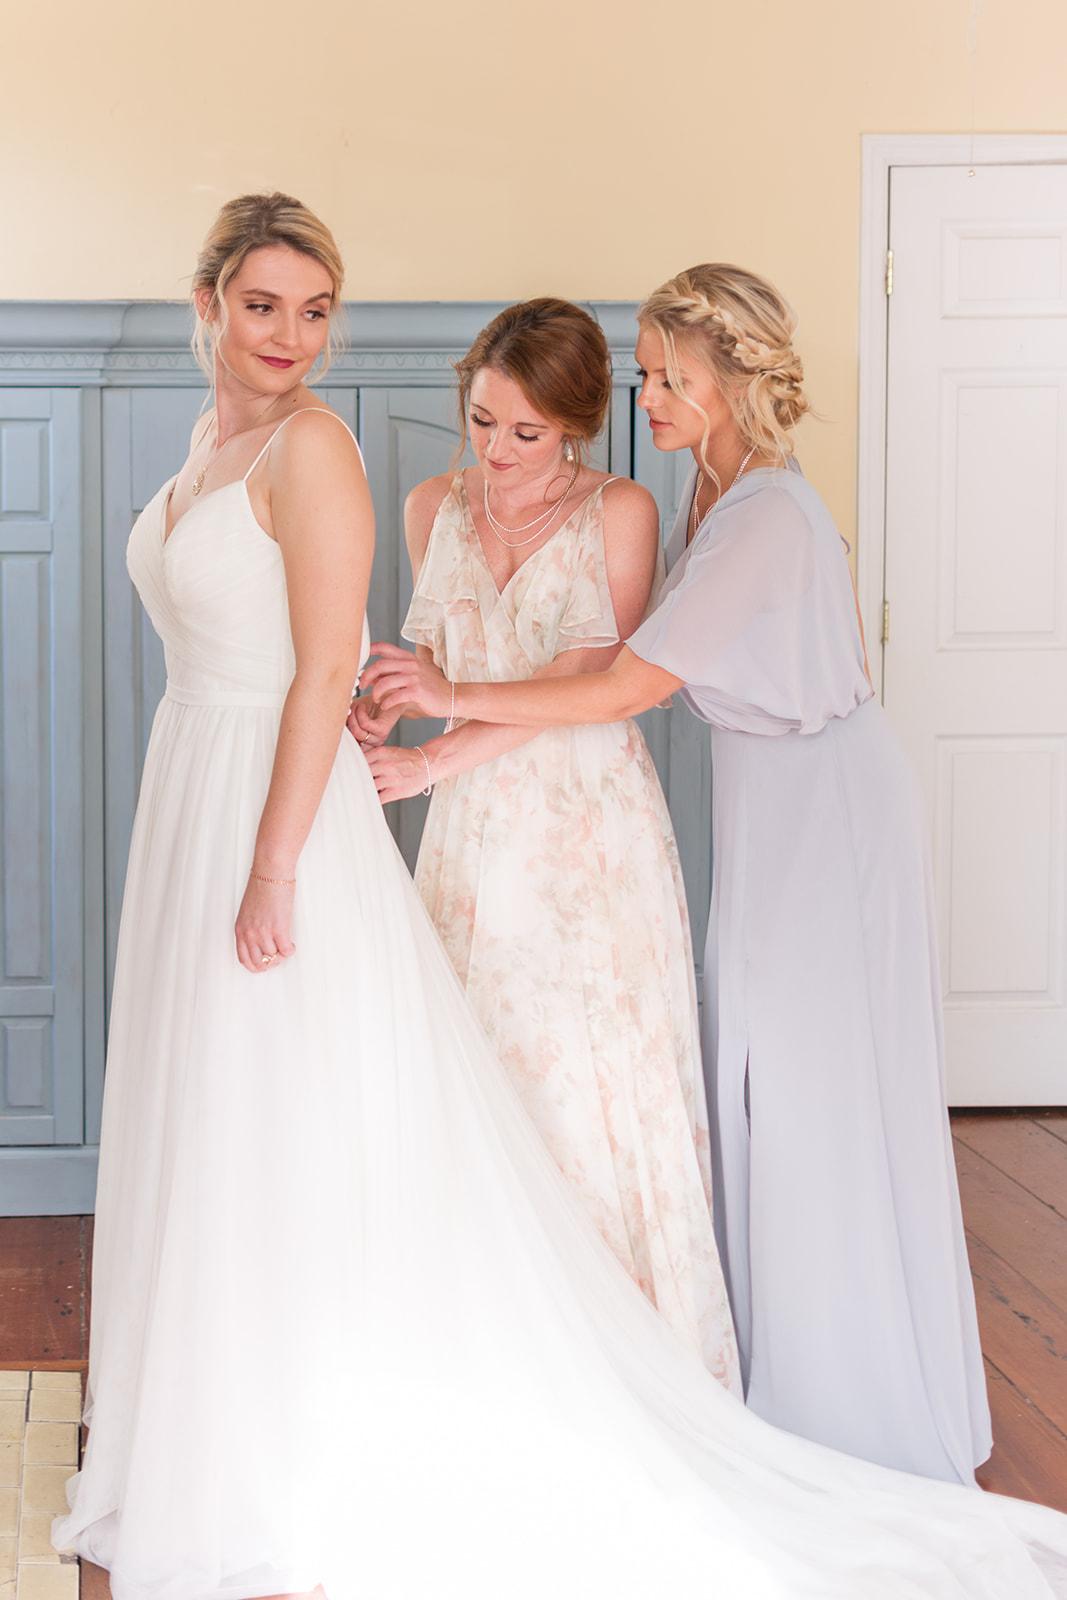 savannah-bridal-shop-ivory-and-beau-savannah-wedding-dresses-rebecca-ingram-wedding-dress-jenny-yoo-floral-print-bridesmaid-dress-charleston-styled-shoot-health-coach-how-to-lose-weight-healthily-as-a-bride.jpg